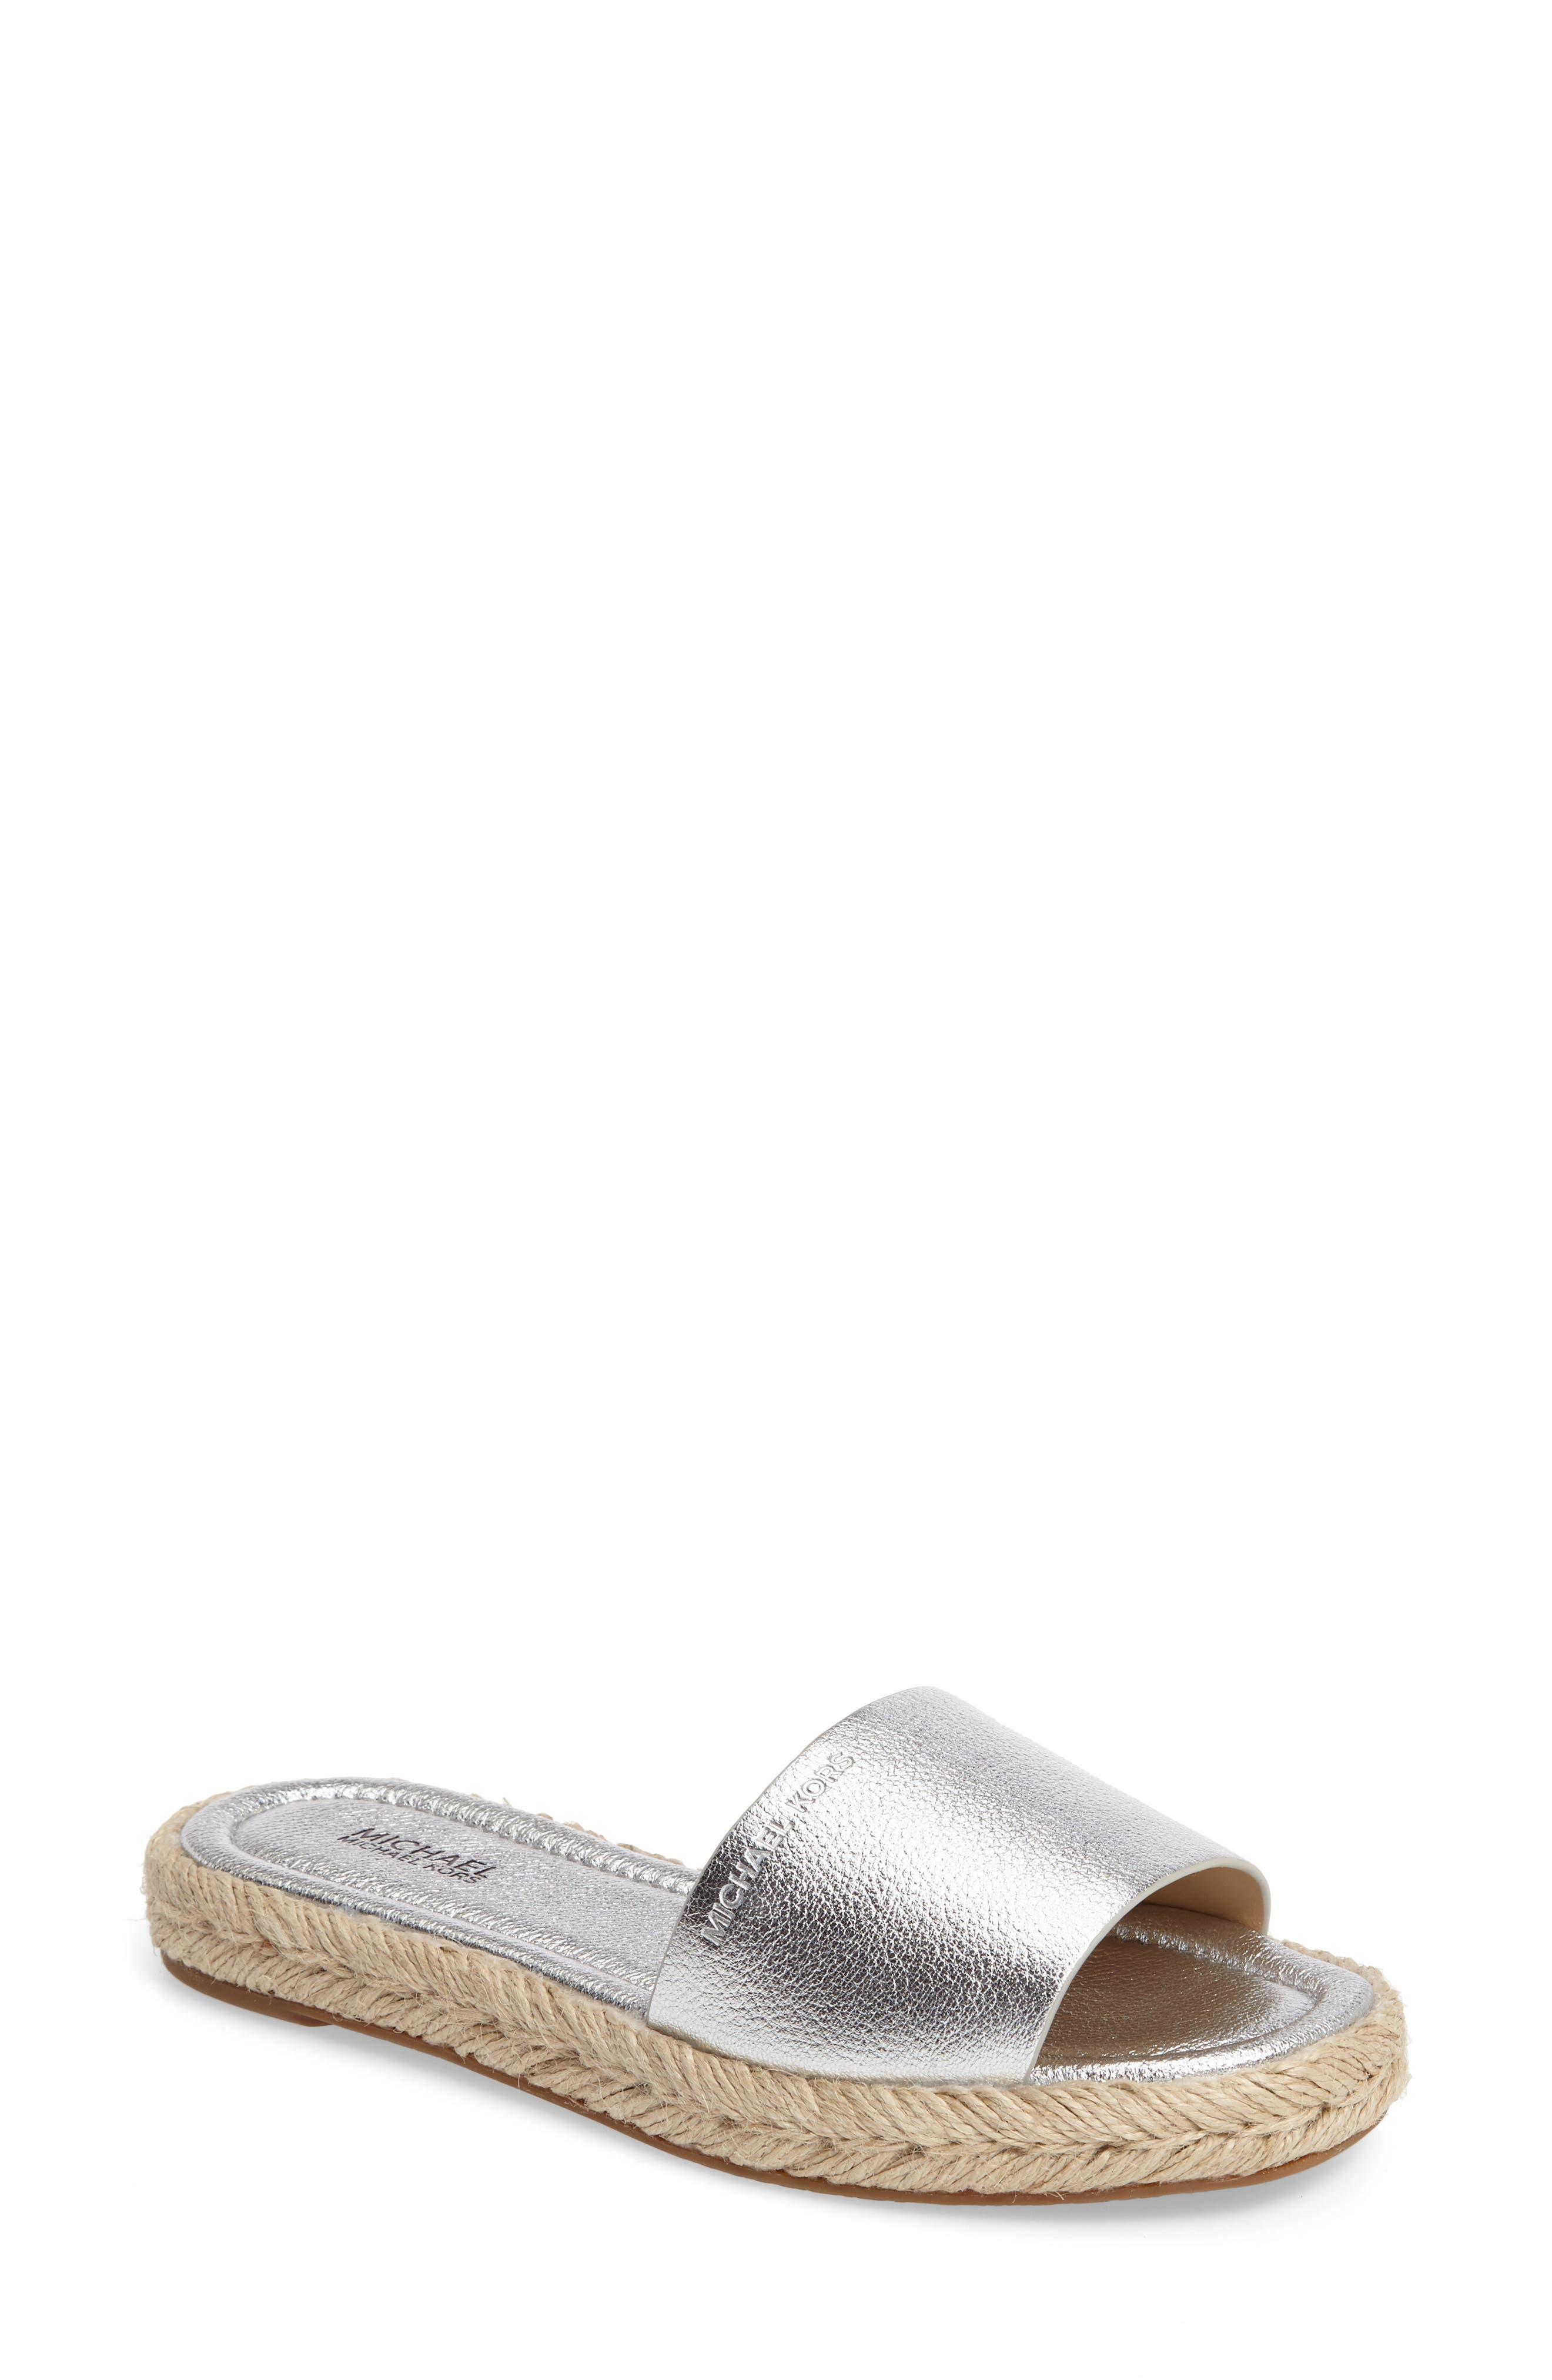 Main Image - MICHAEL Michael Kors Dempsey Slide Sandal (Women)